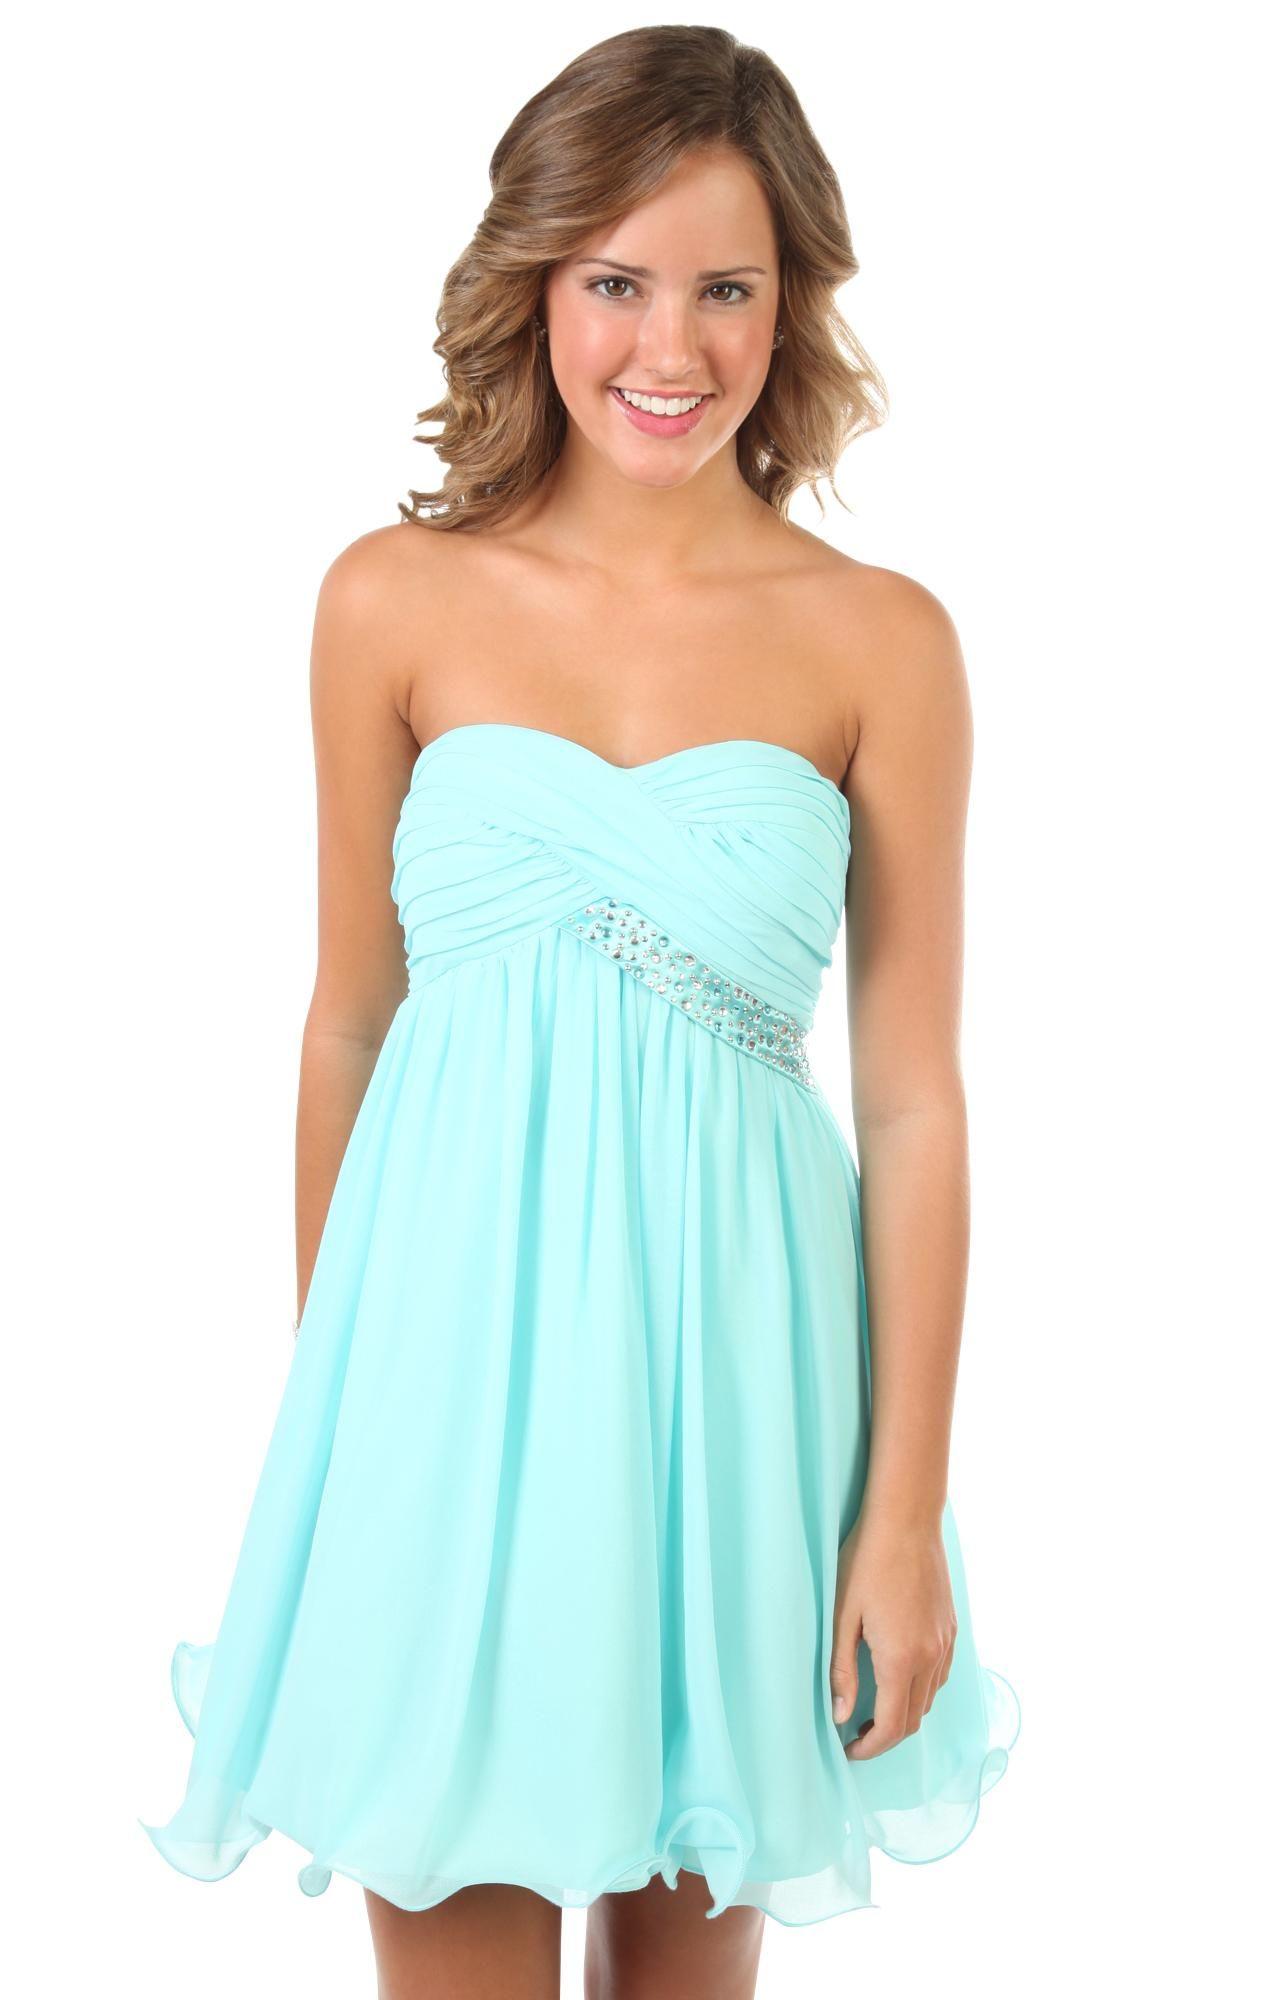 strapless short prom dress with rhinestone bust trim | Dream closet ...